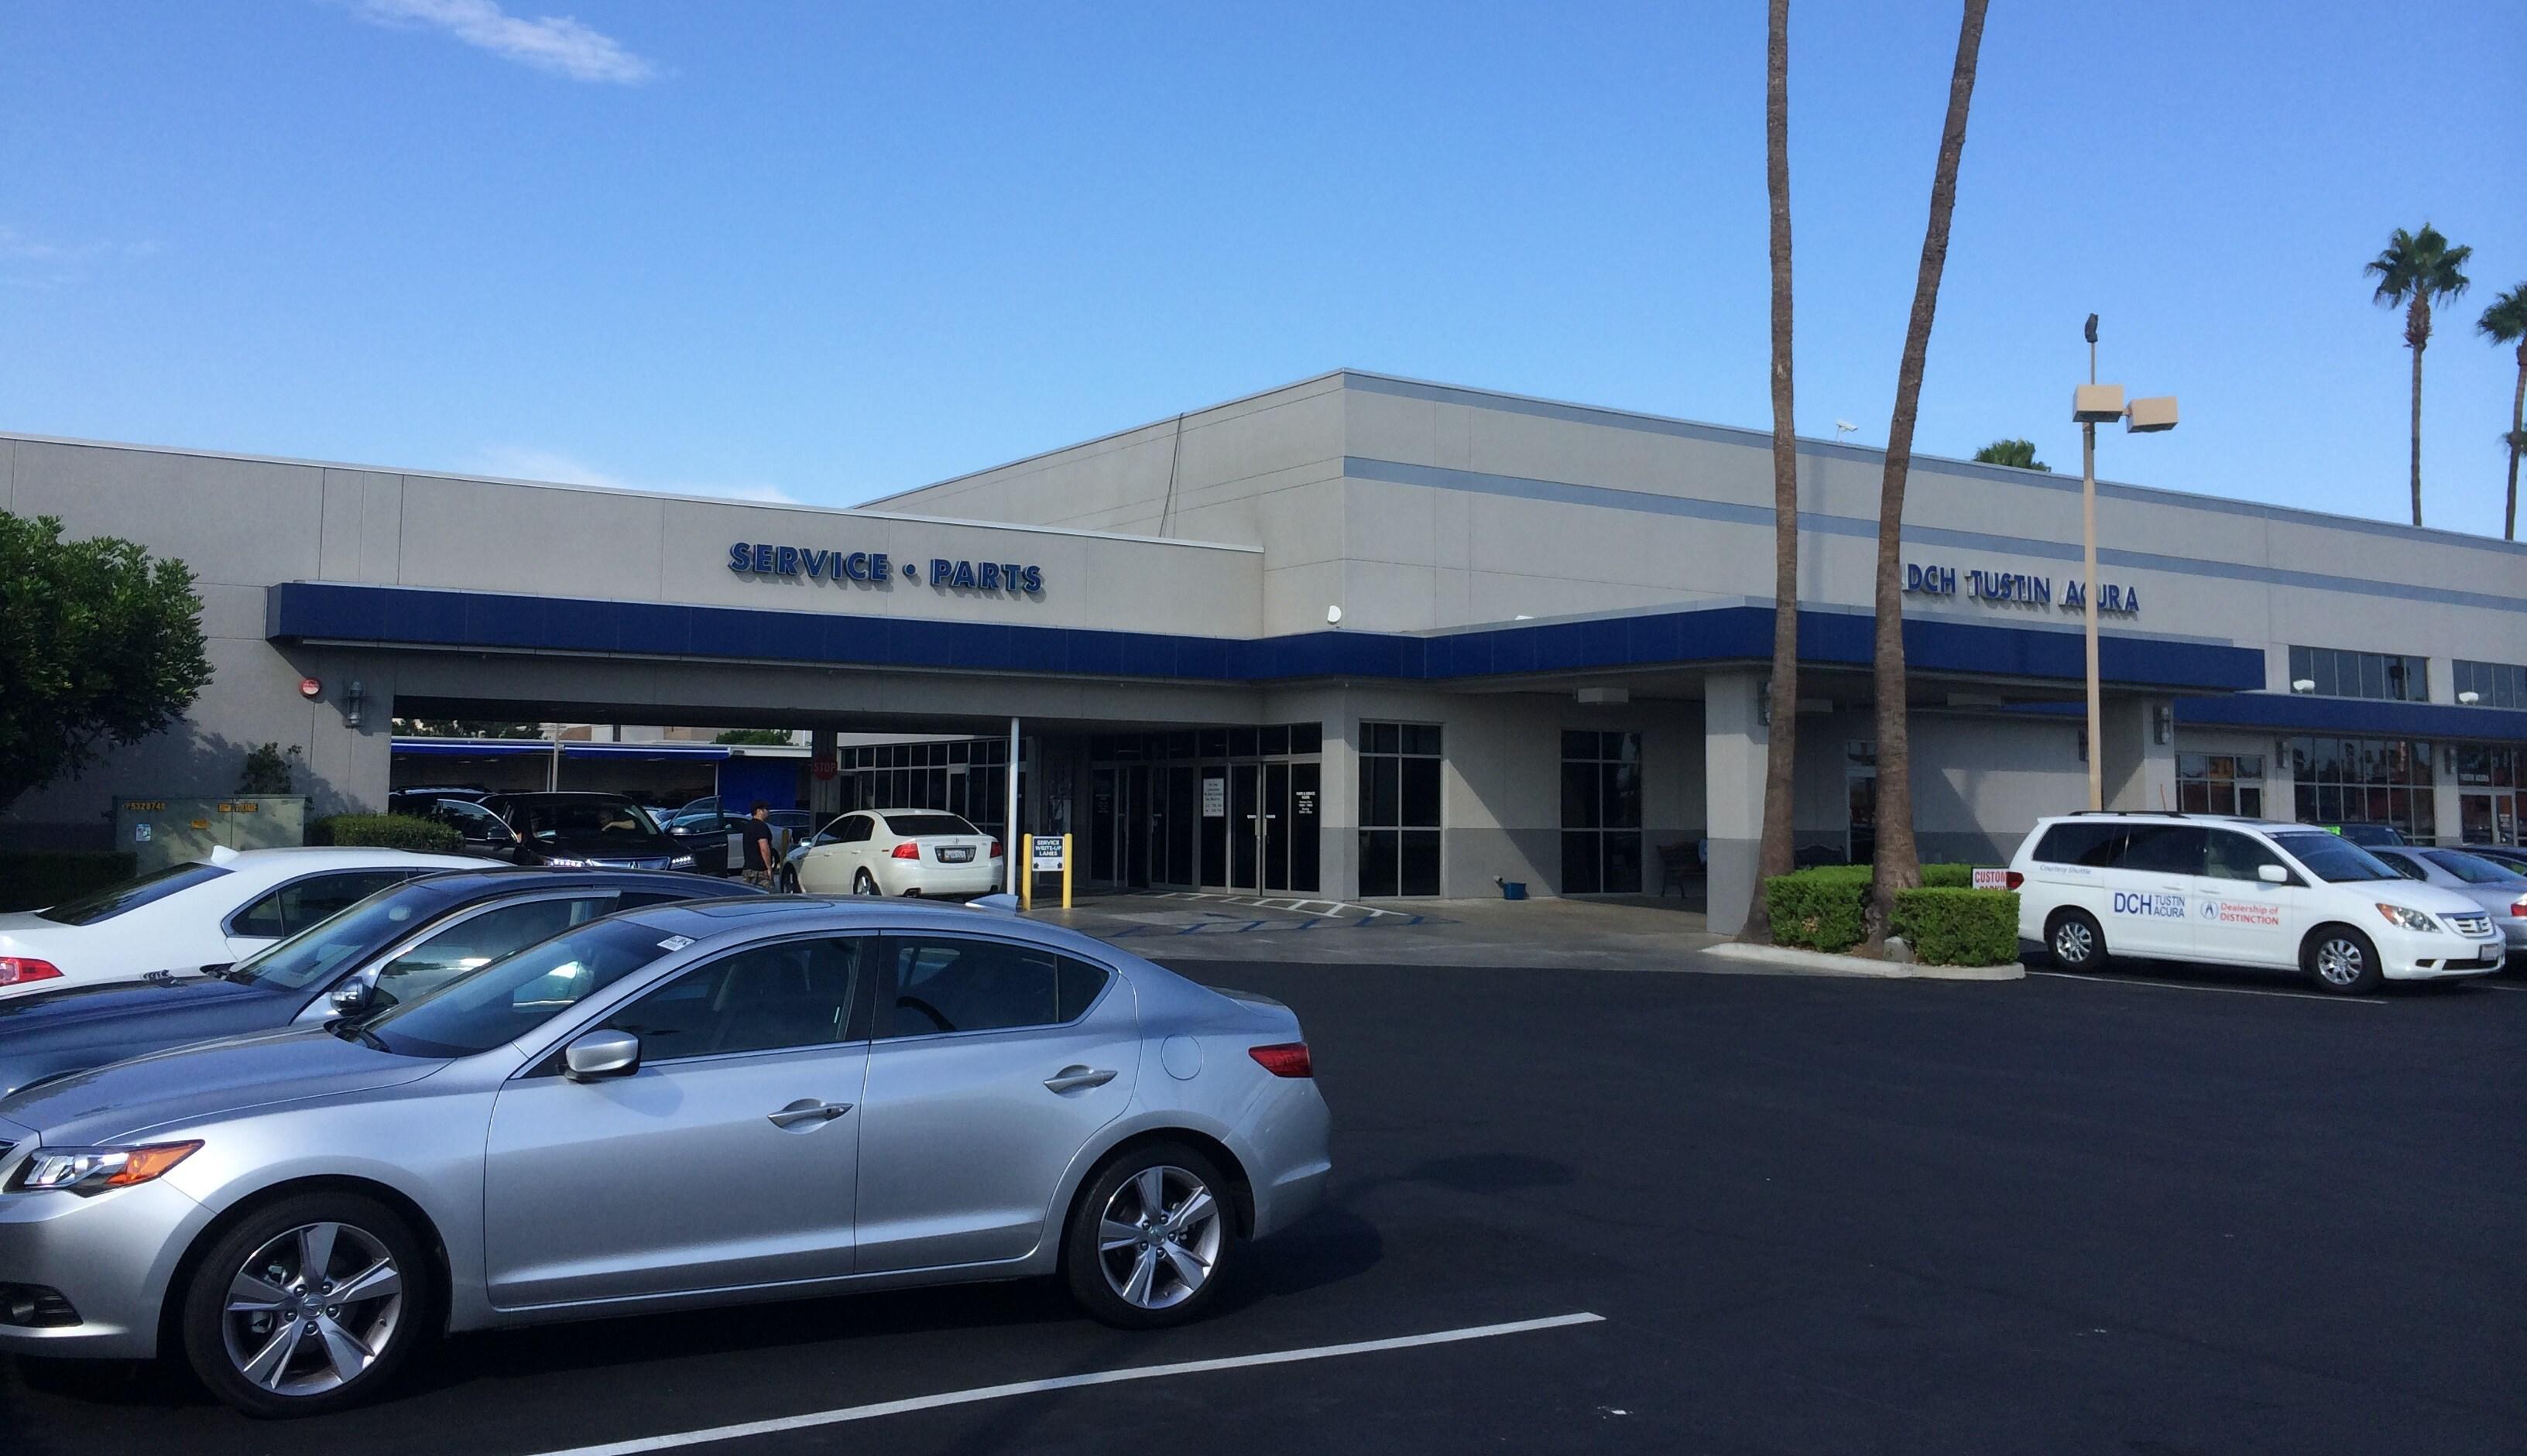 Acura Repairs Auto Service At DCH Tustin Acura Serving Orange - Tustin acura service